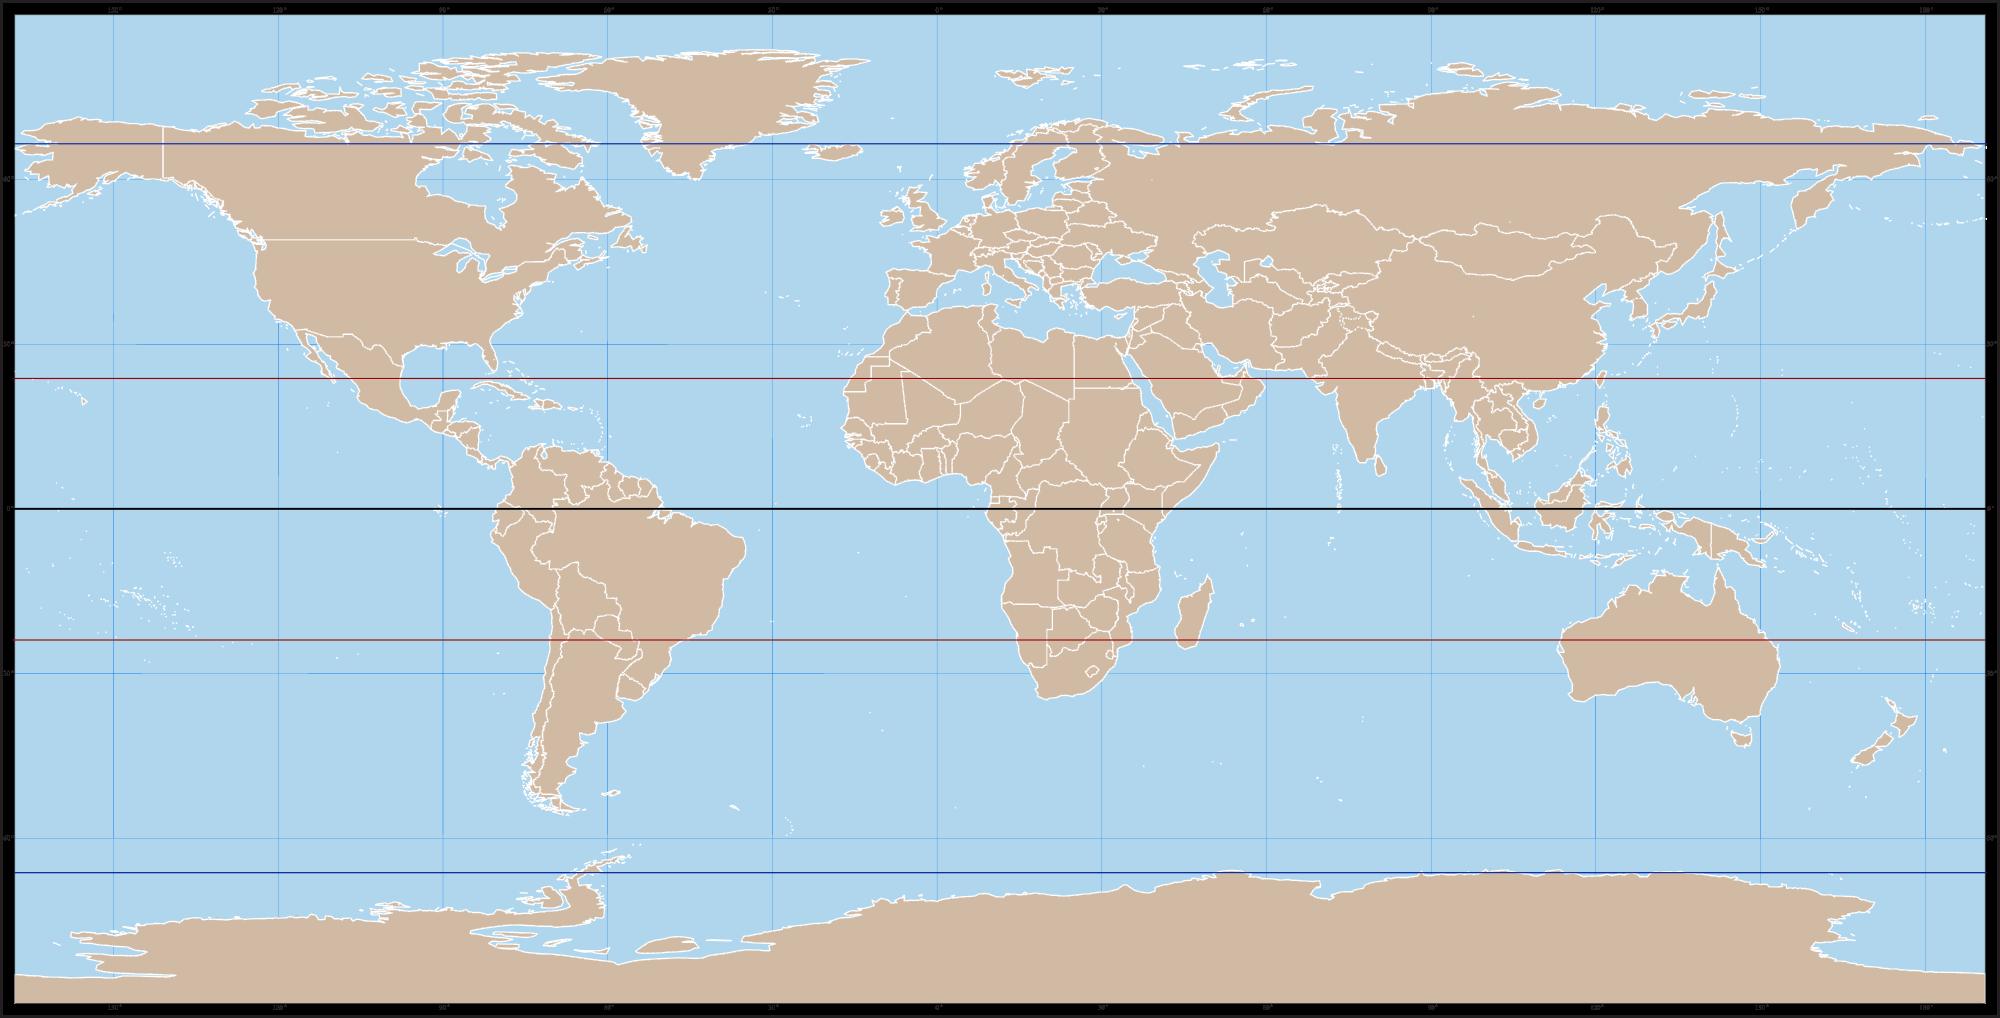 weltkarte mit äquator Weltkarte   Äquator, Wendekreise und Polarkreise | Weltkugel Globus.de weltkarte mit äquator